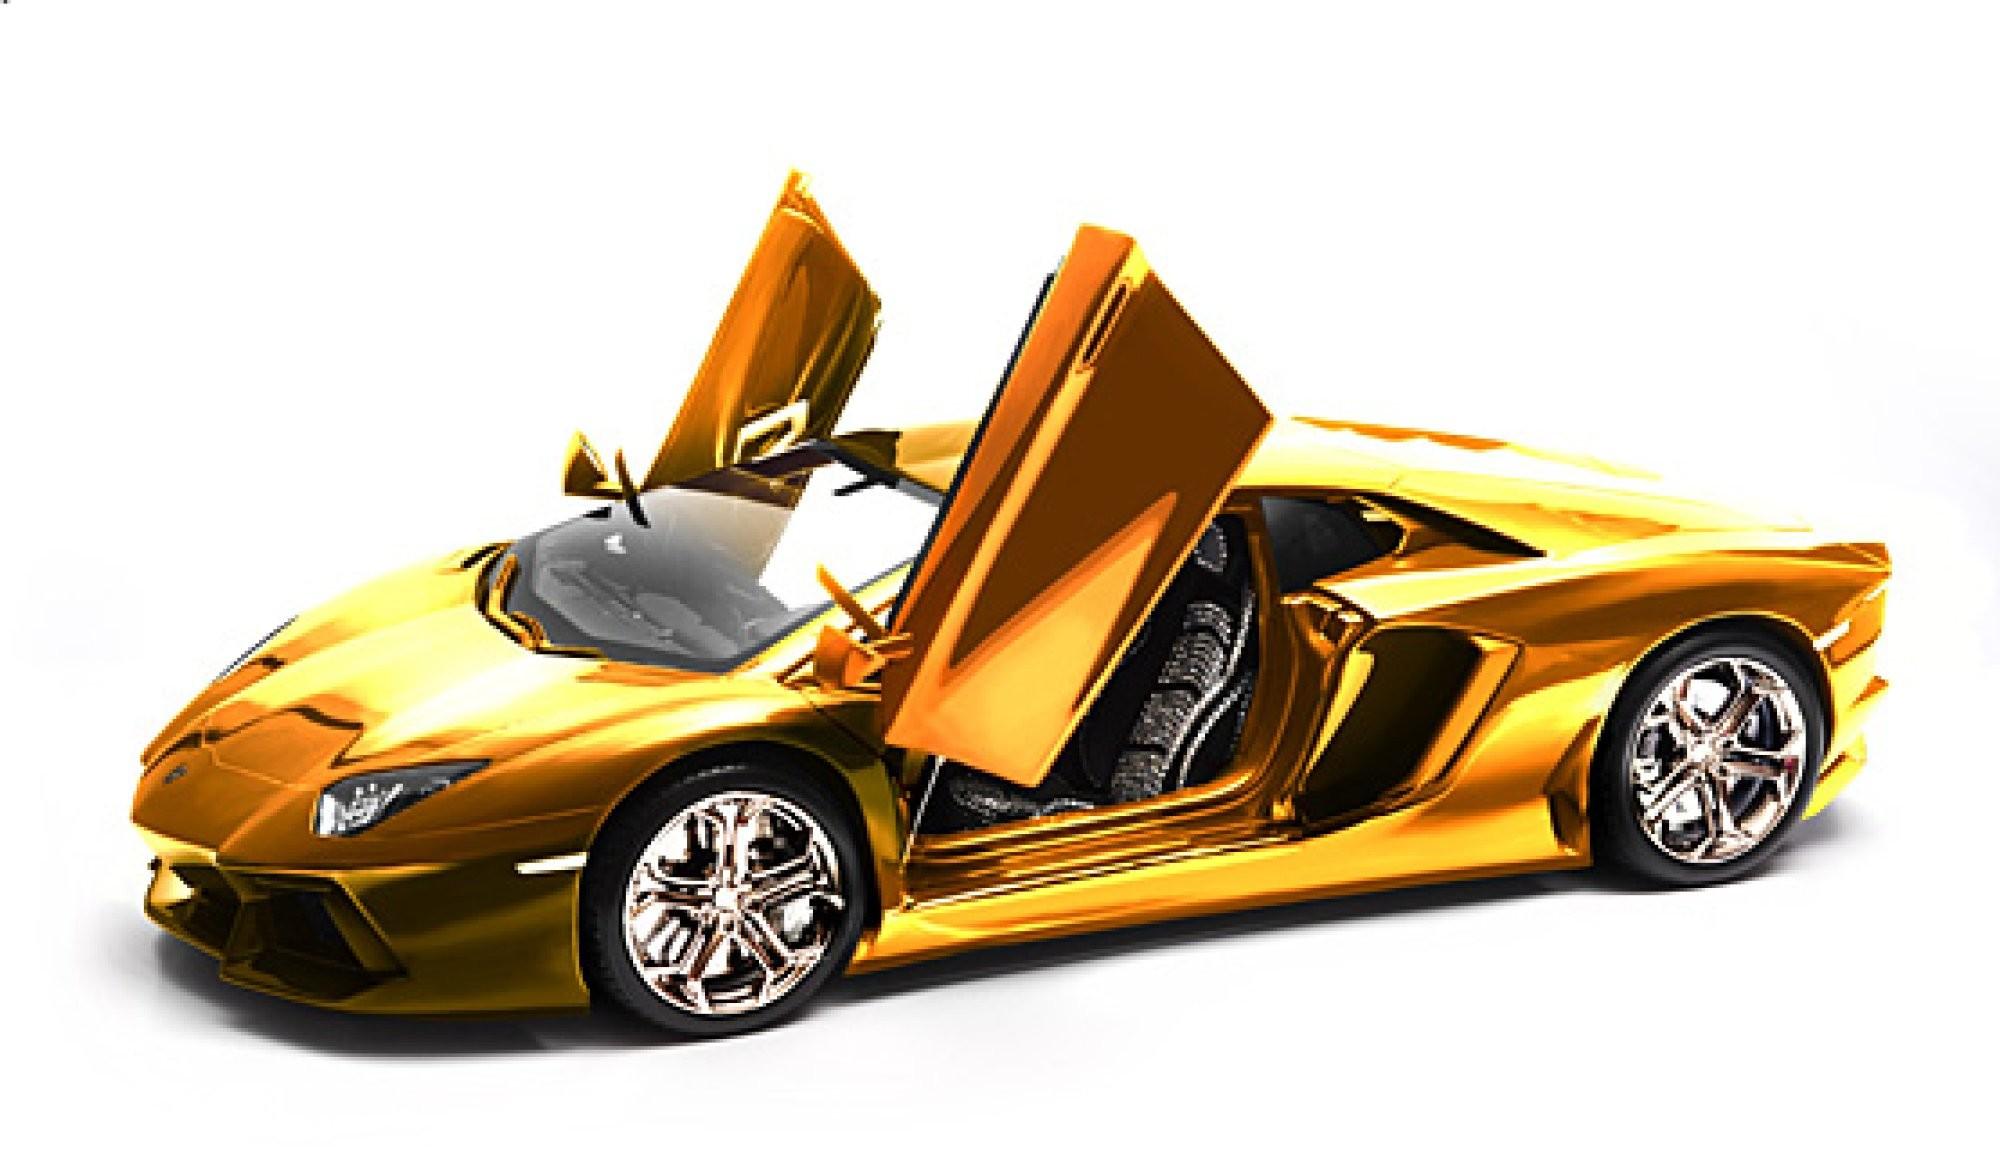 aventador gold doors lamborghini aventador gold night view golden .